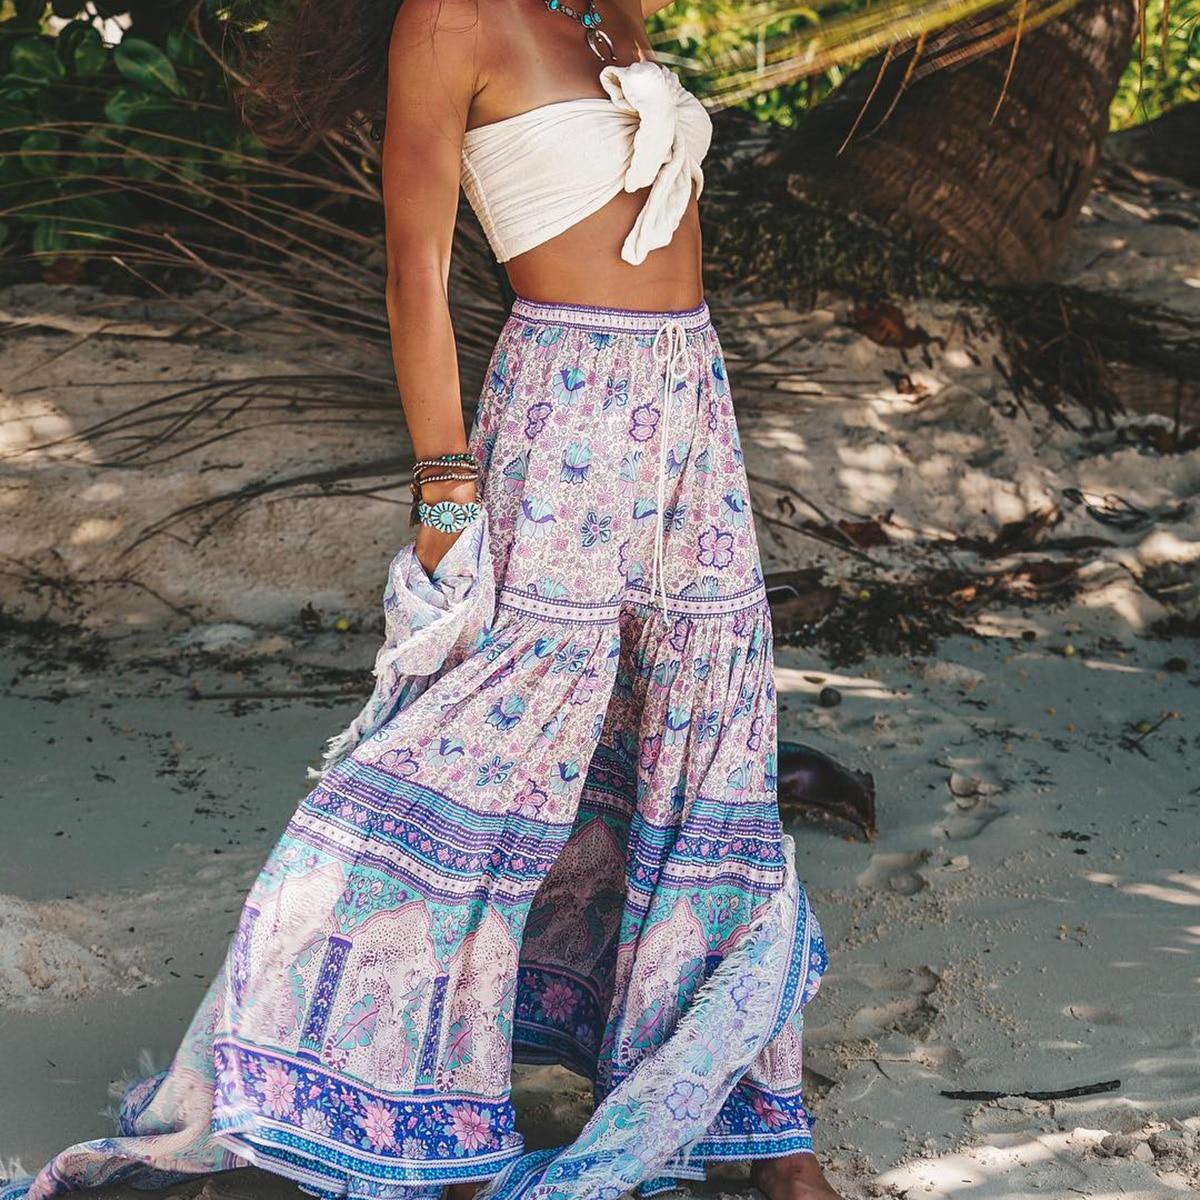 Jastie 2019 Summer Skirt Boho Floral Print Skirts Casual Elastic Waist Tie Chic Beach Skirt Loose Long Maxi Skirts Faldas Mujer